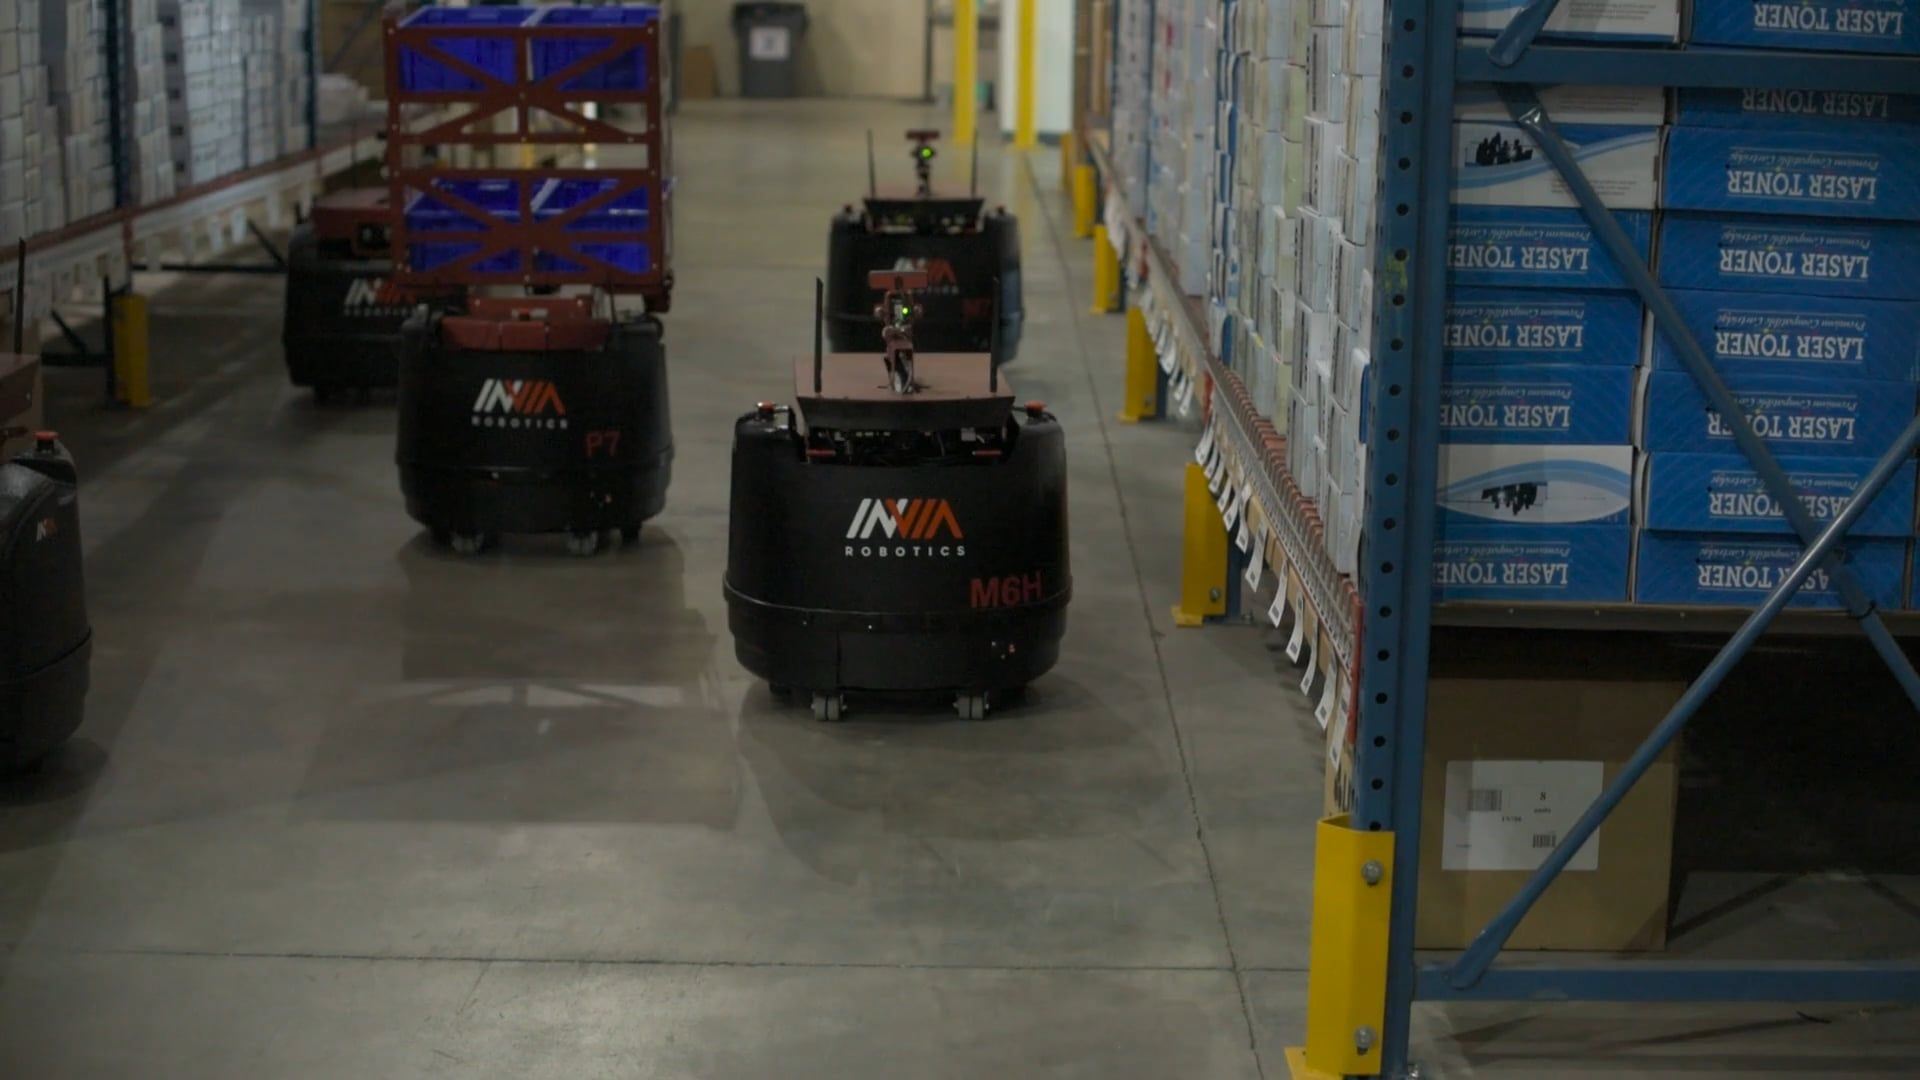 Invia Robotics/LD Products CaseStudy